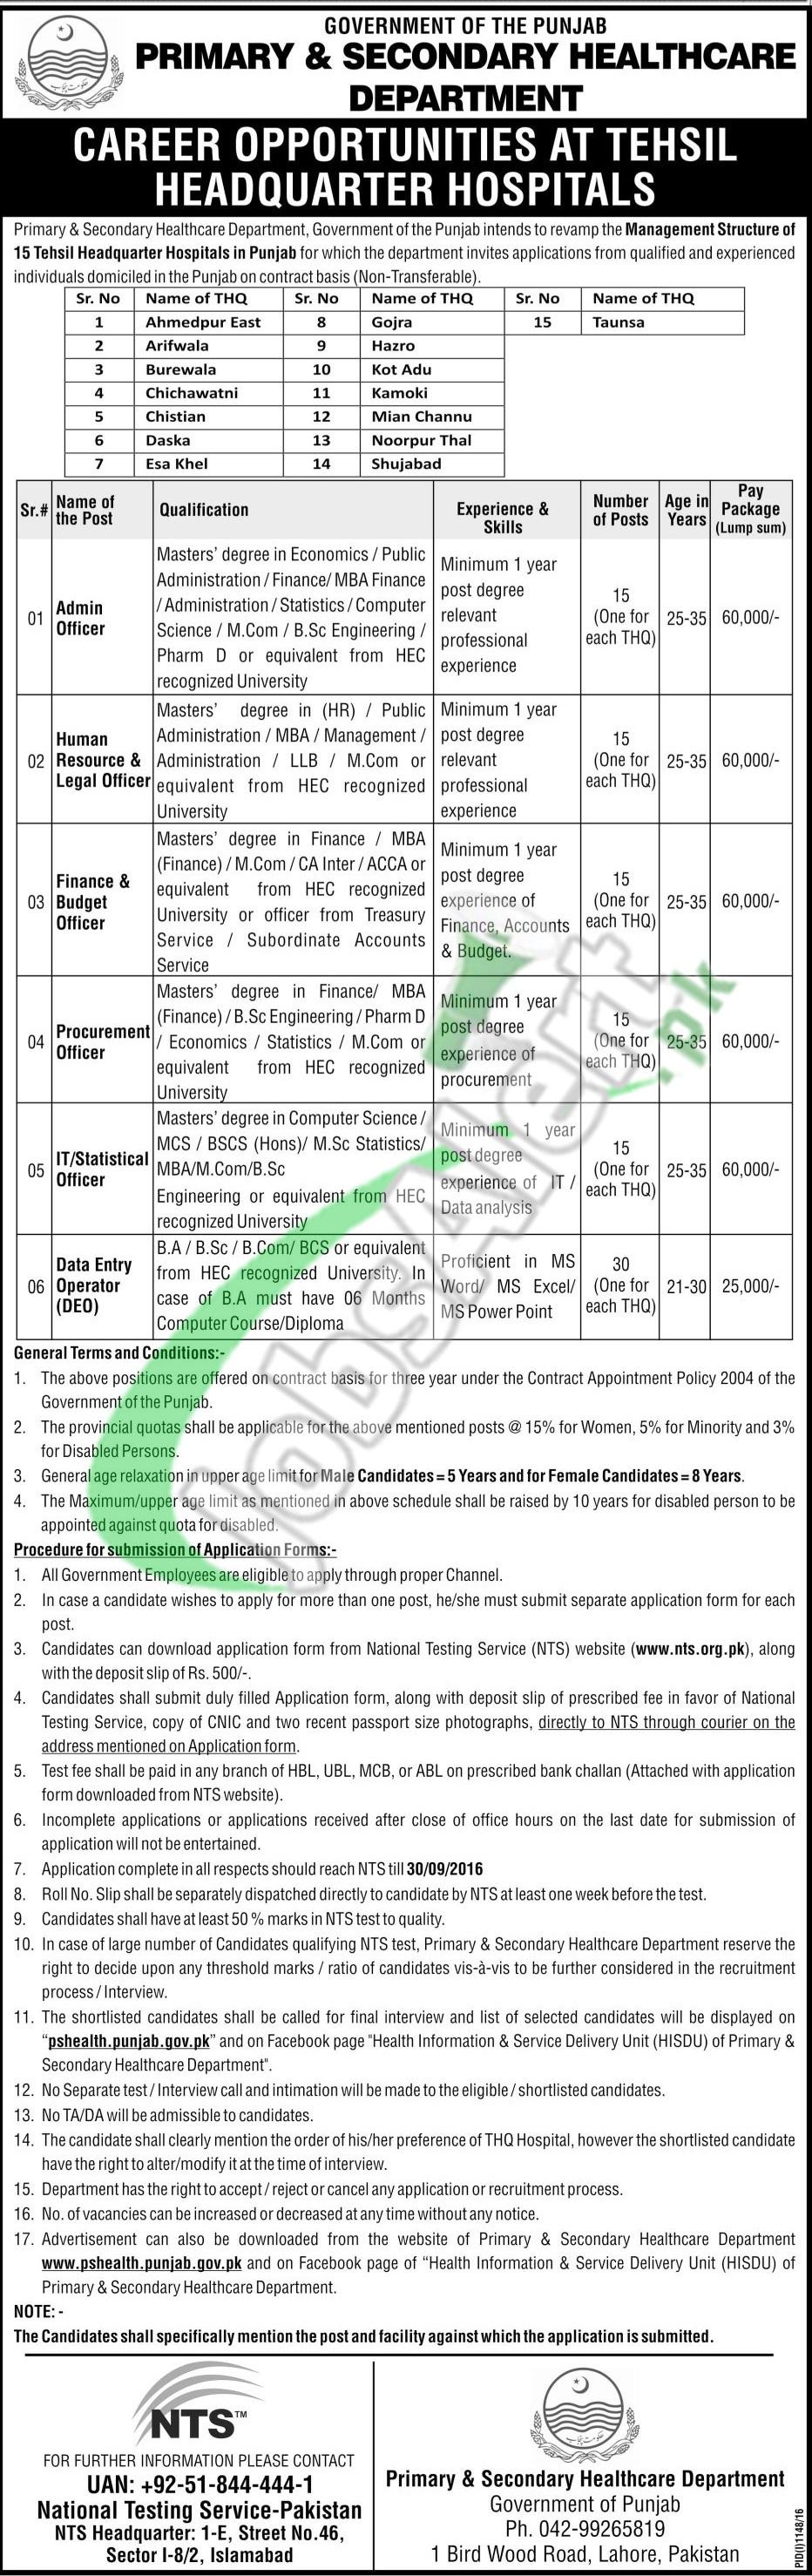 Primary & Secondary Healthcare Department Jobs